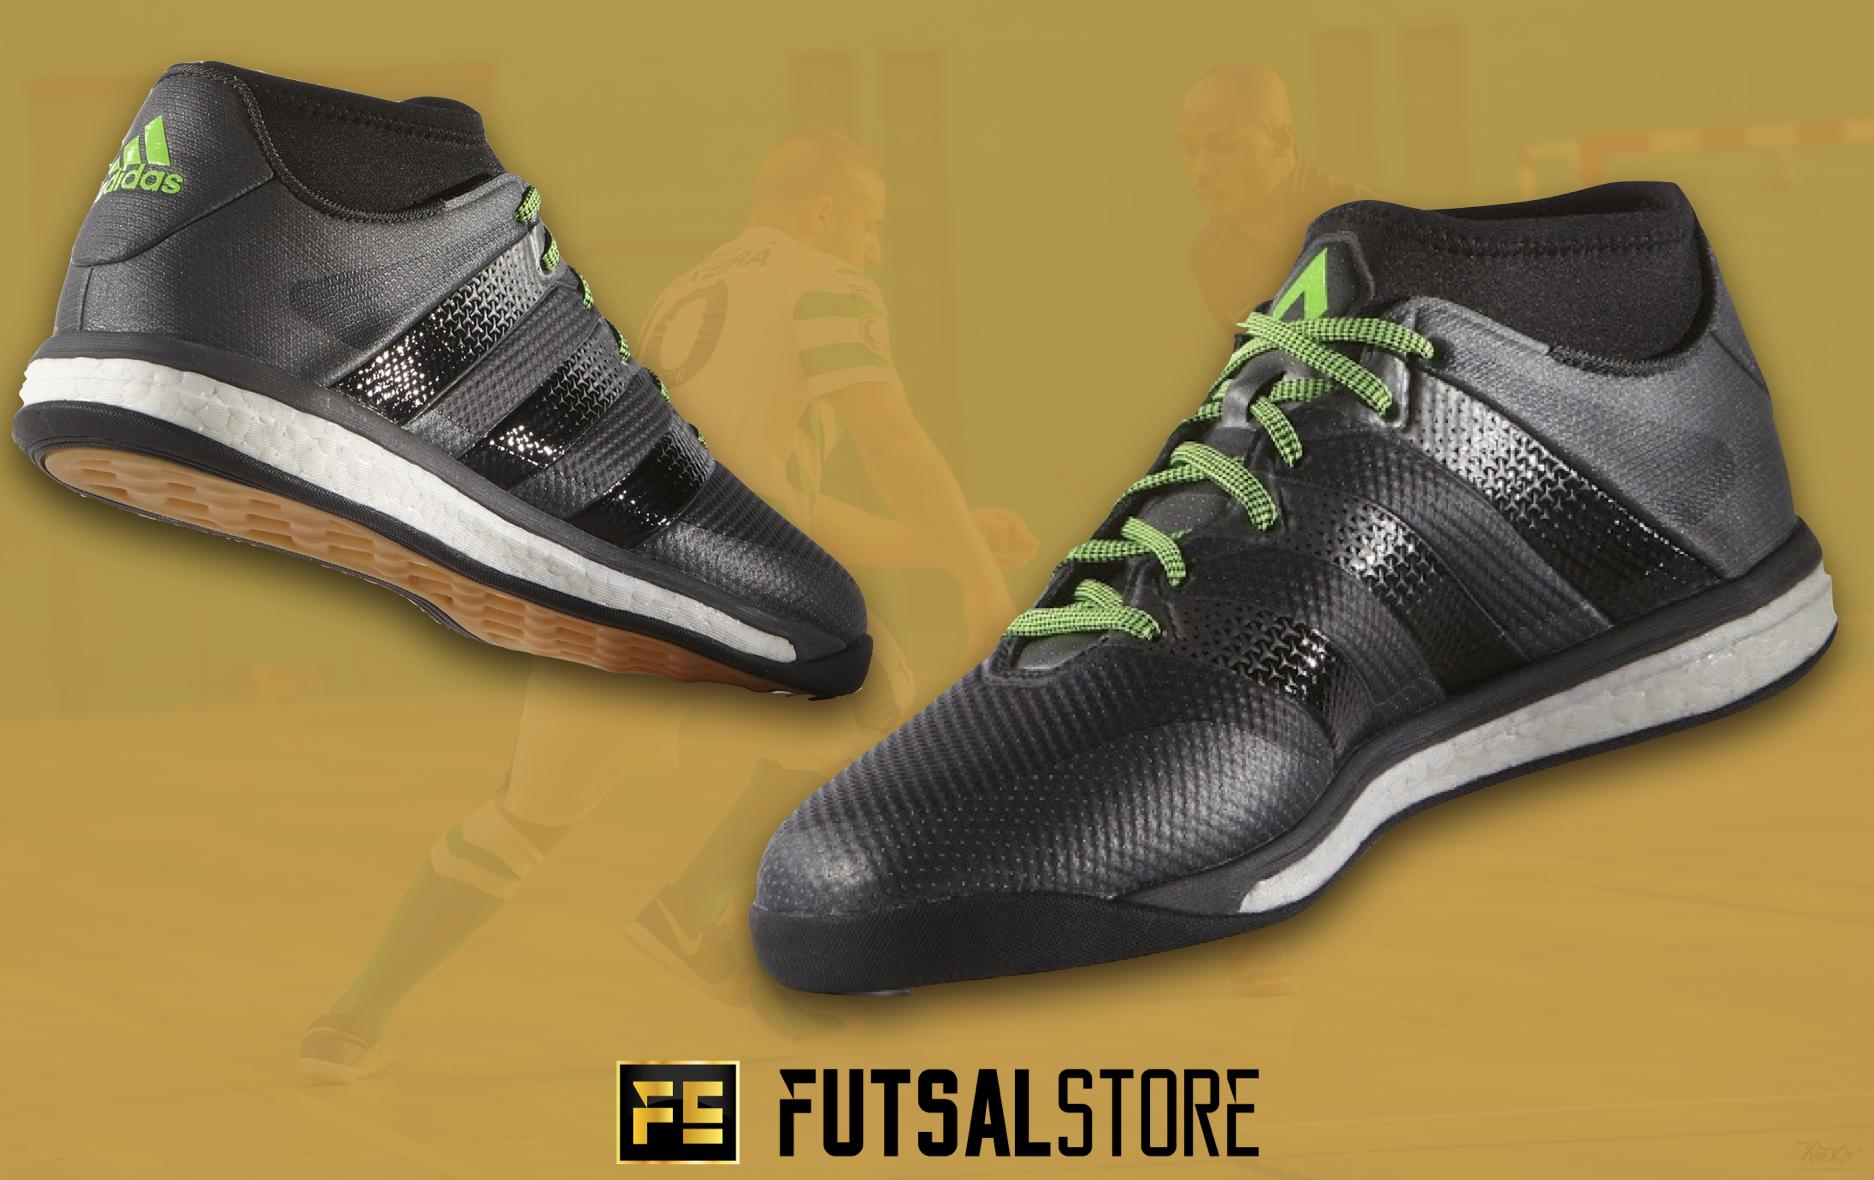 Street J Enfant Futsal Messi Adidas Pour chaussure Futsal Ic De 154 nO0wPX8k